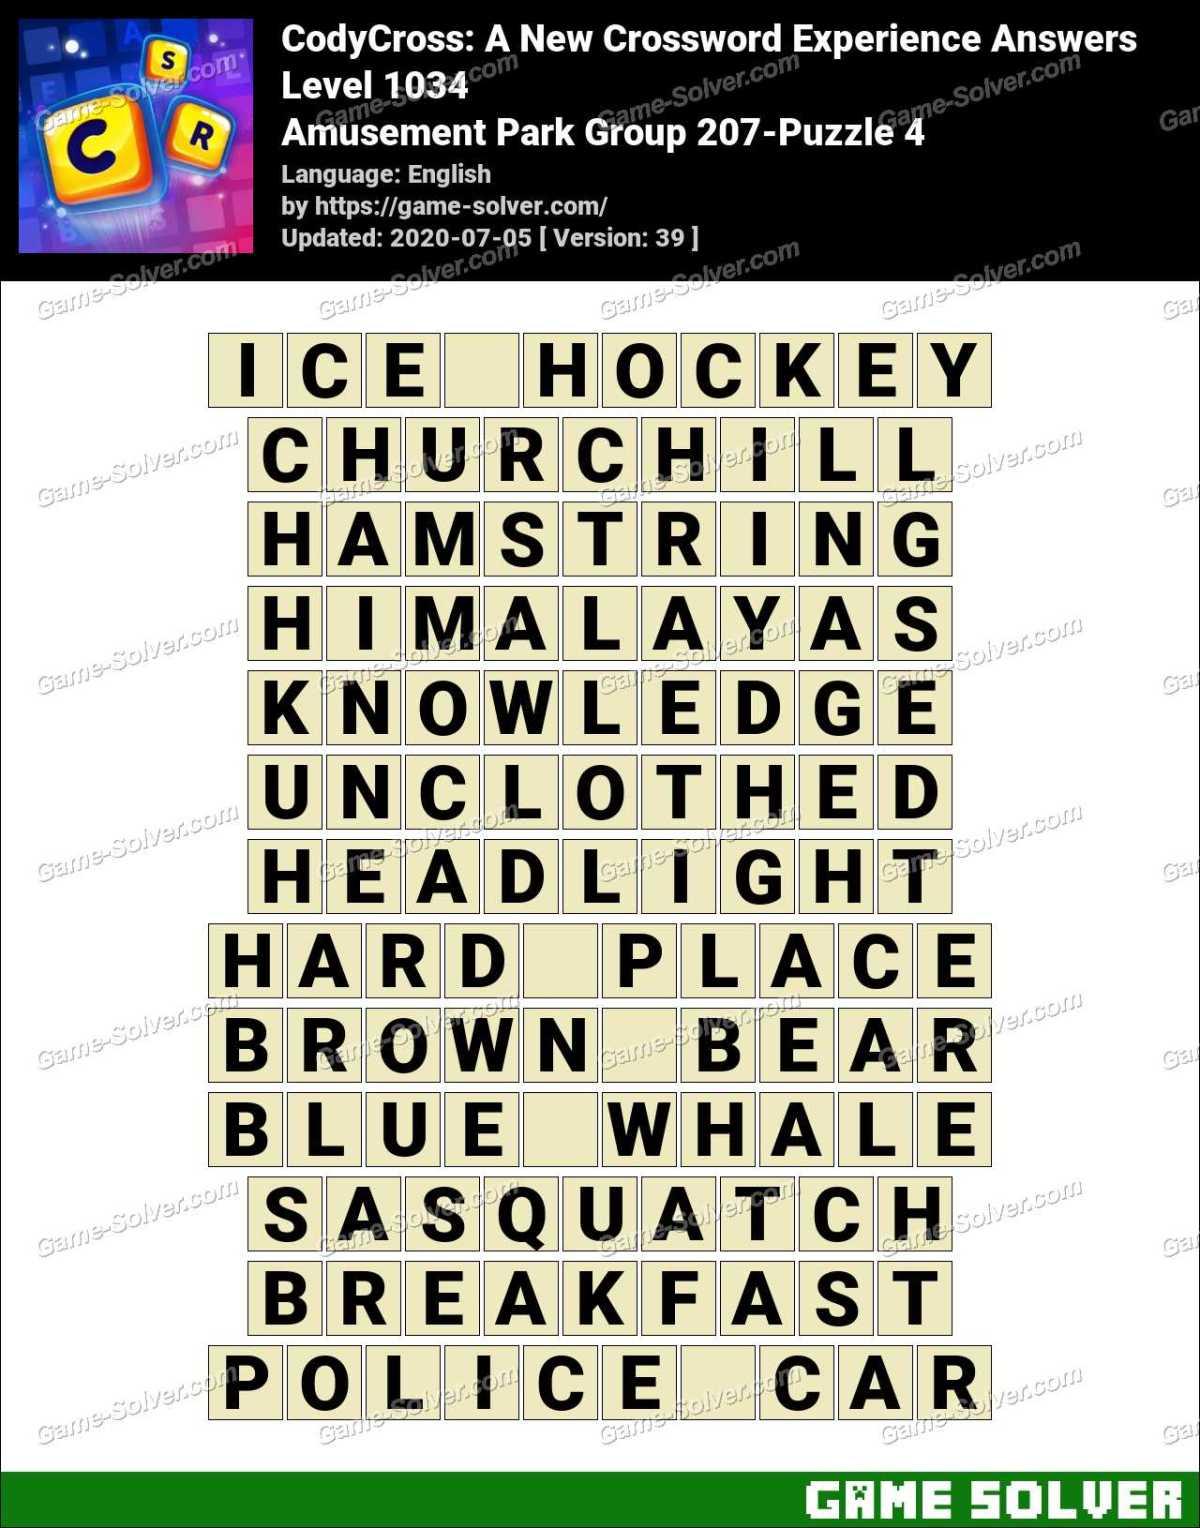 CodyCross Amusement Park Group 207-Puzzle 4 Answers